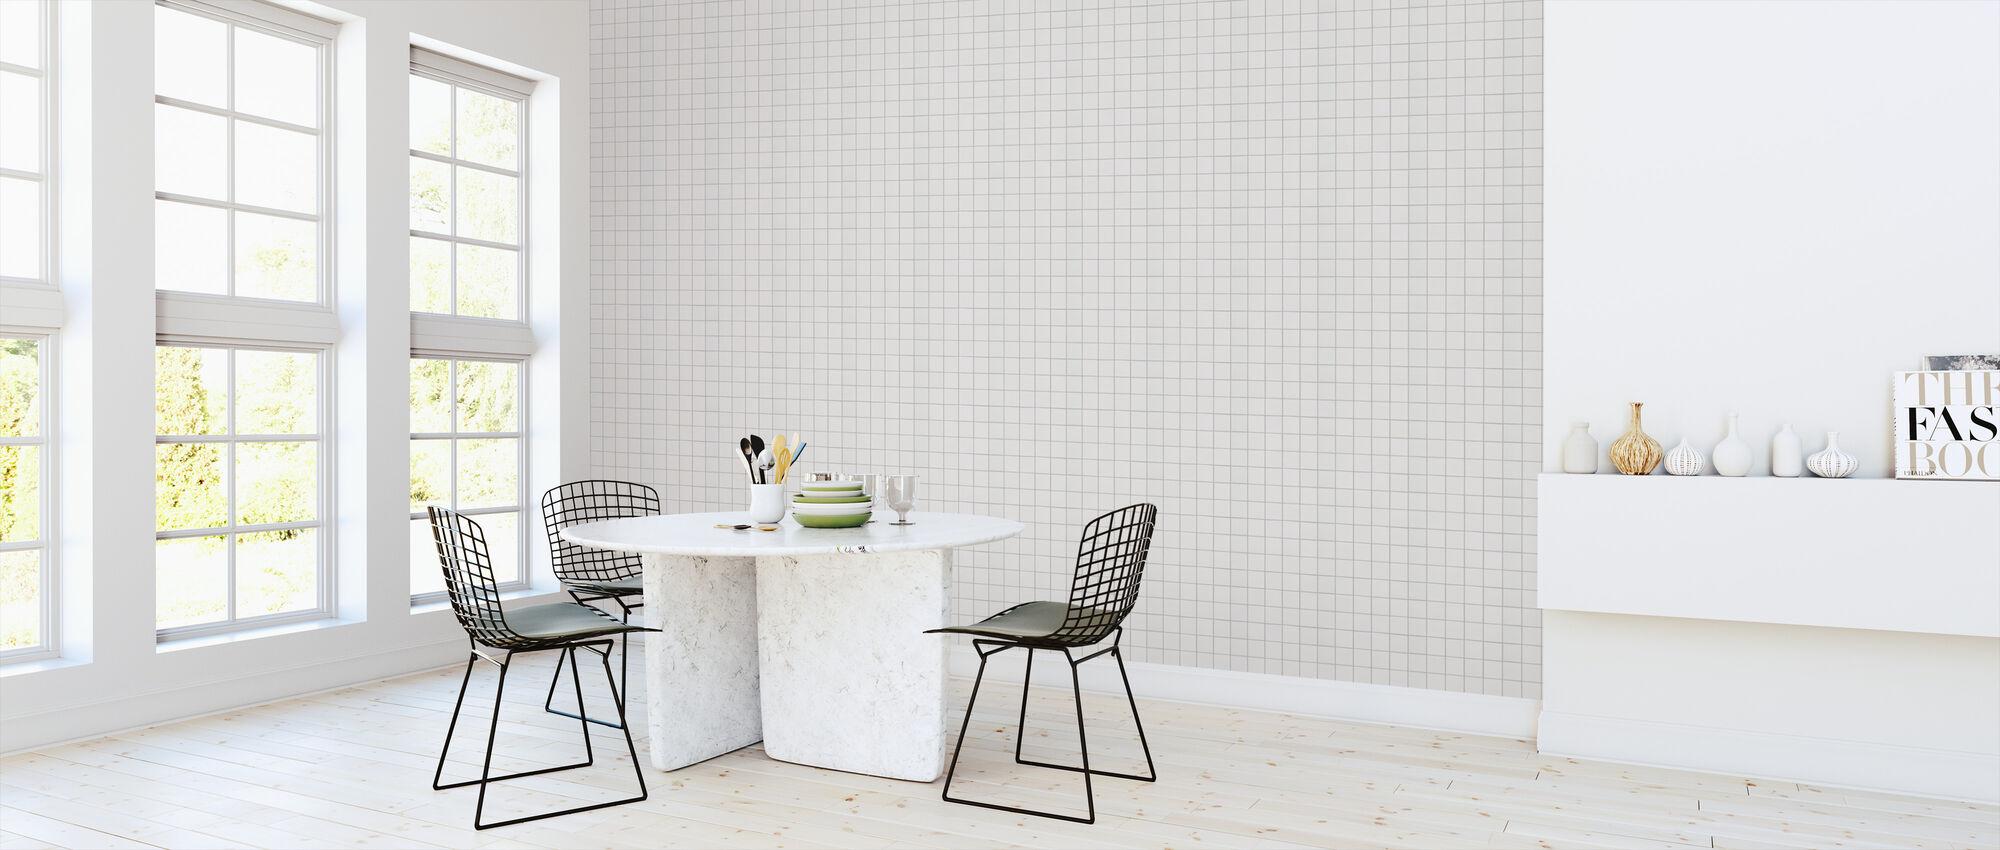 White Ceramic Tiles - 10x10 Grey Seam - Wallpaper - Kitchen